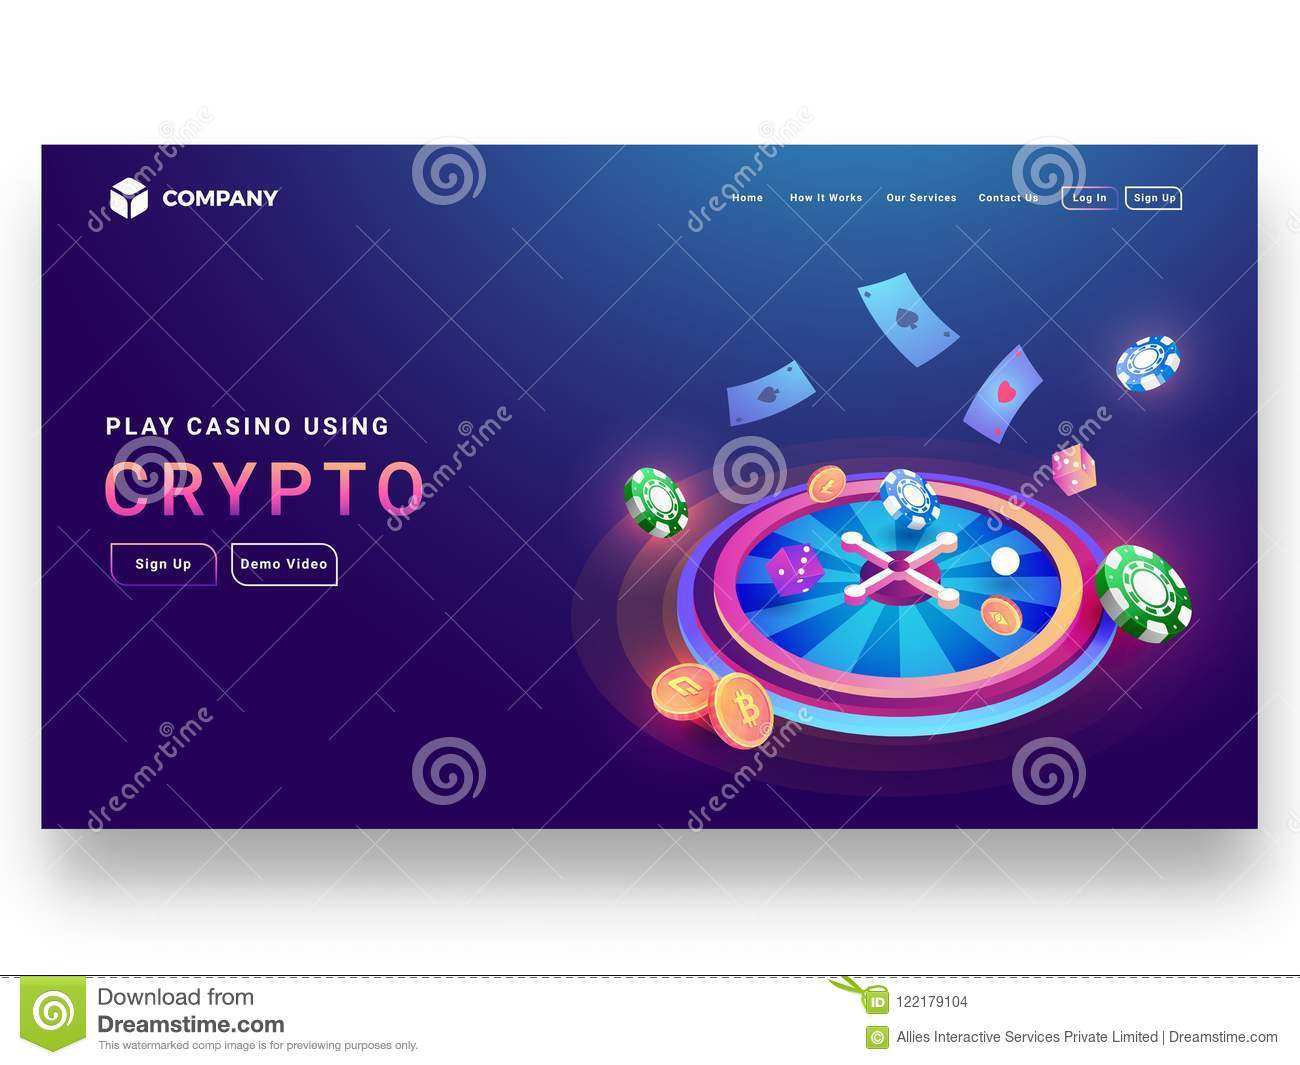 Wild Jack crypto slots mBit Casino bonus code